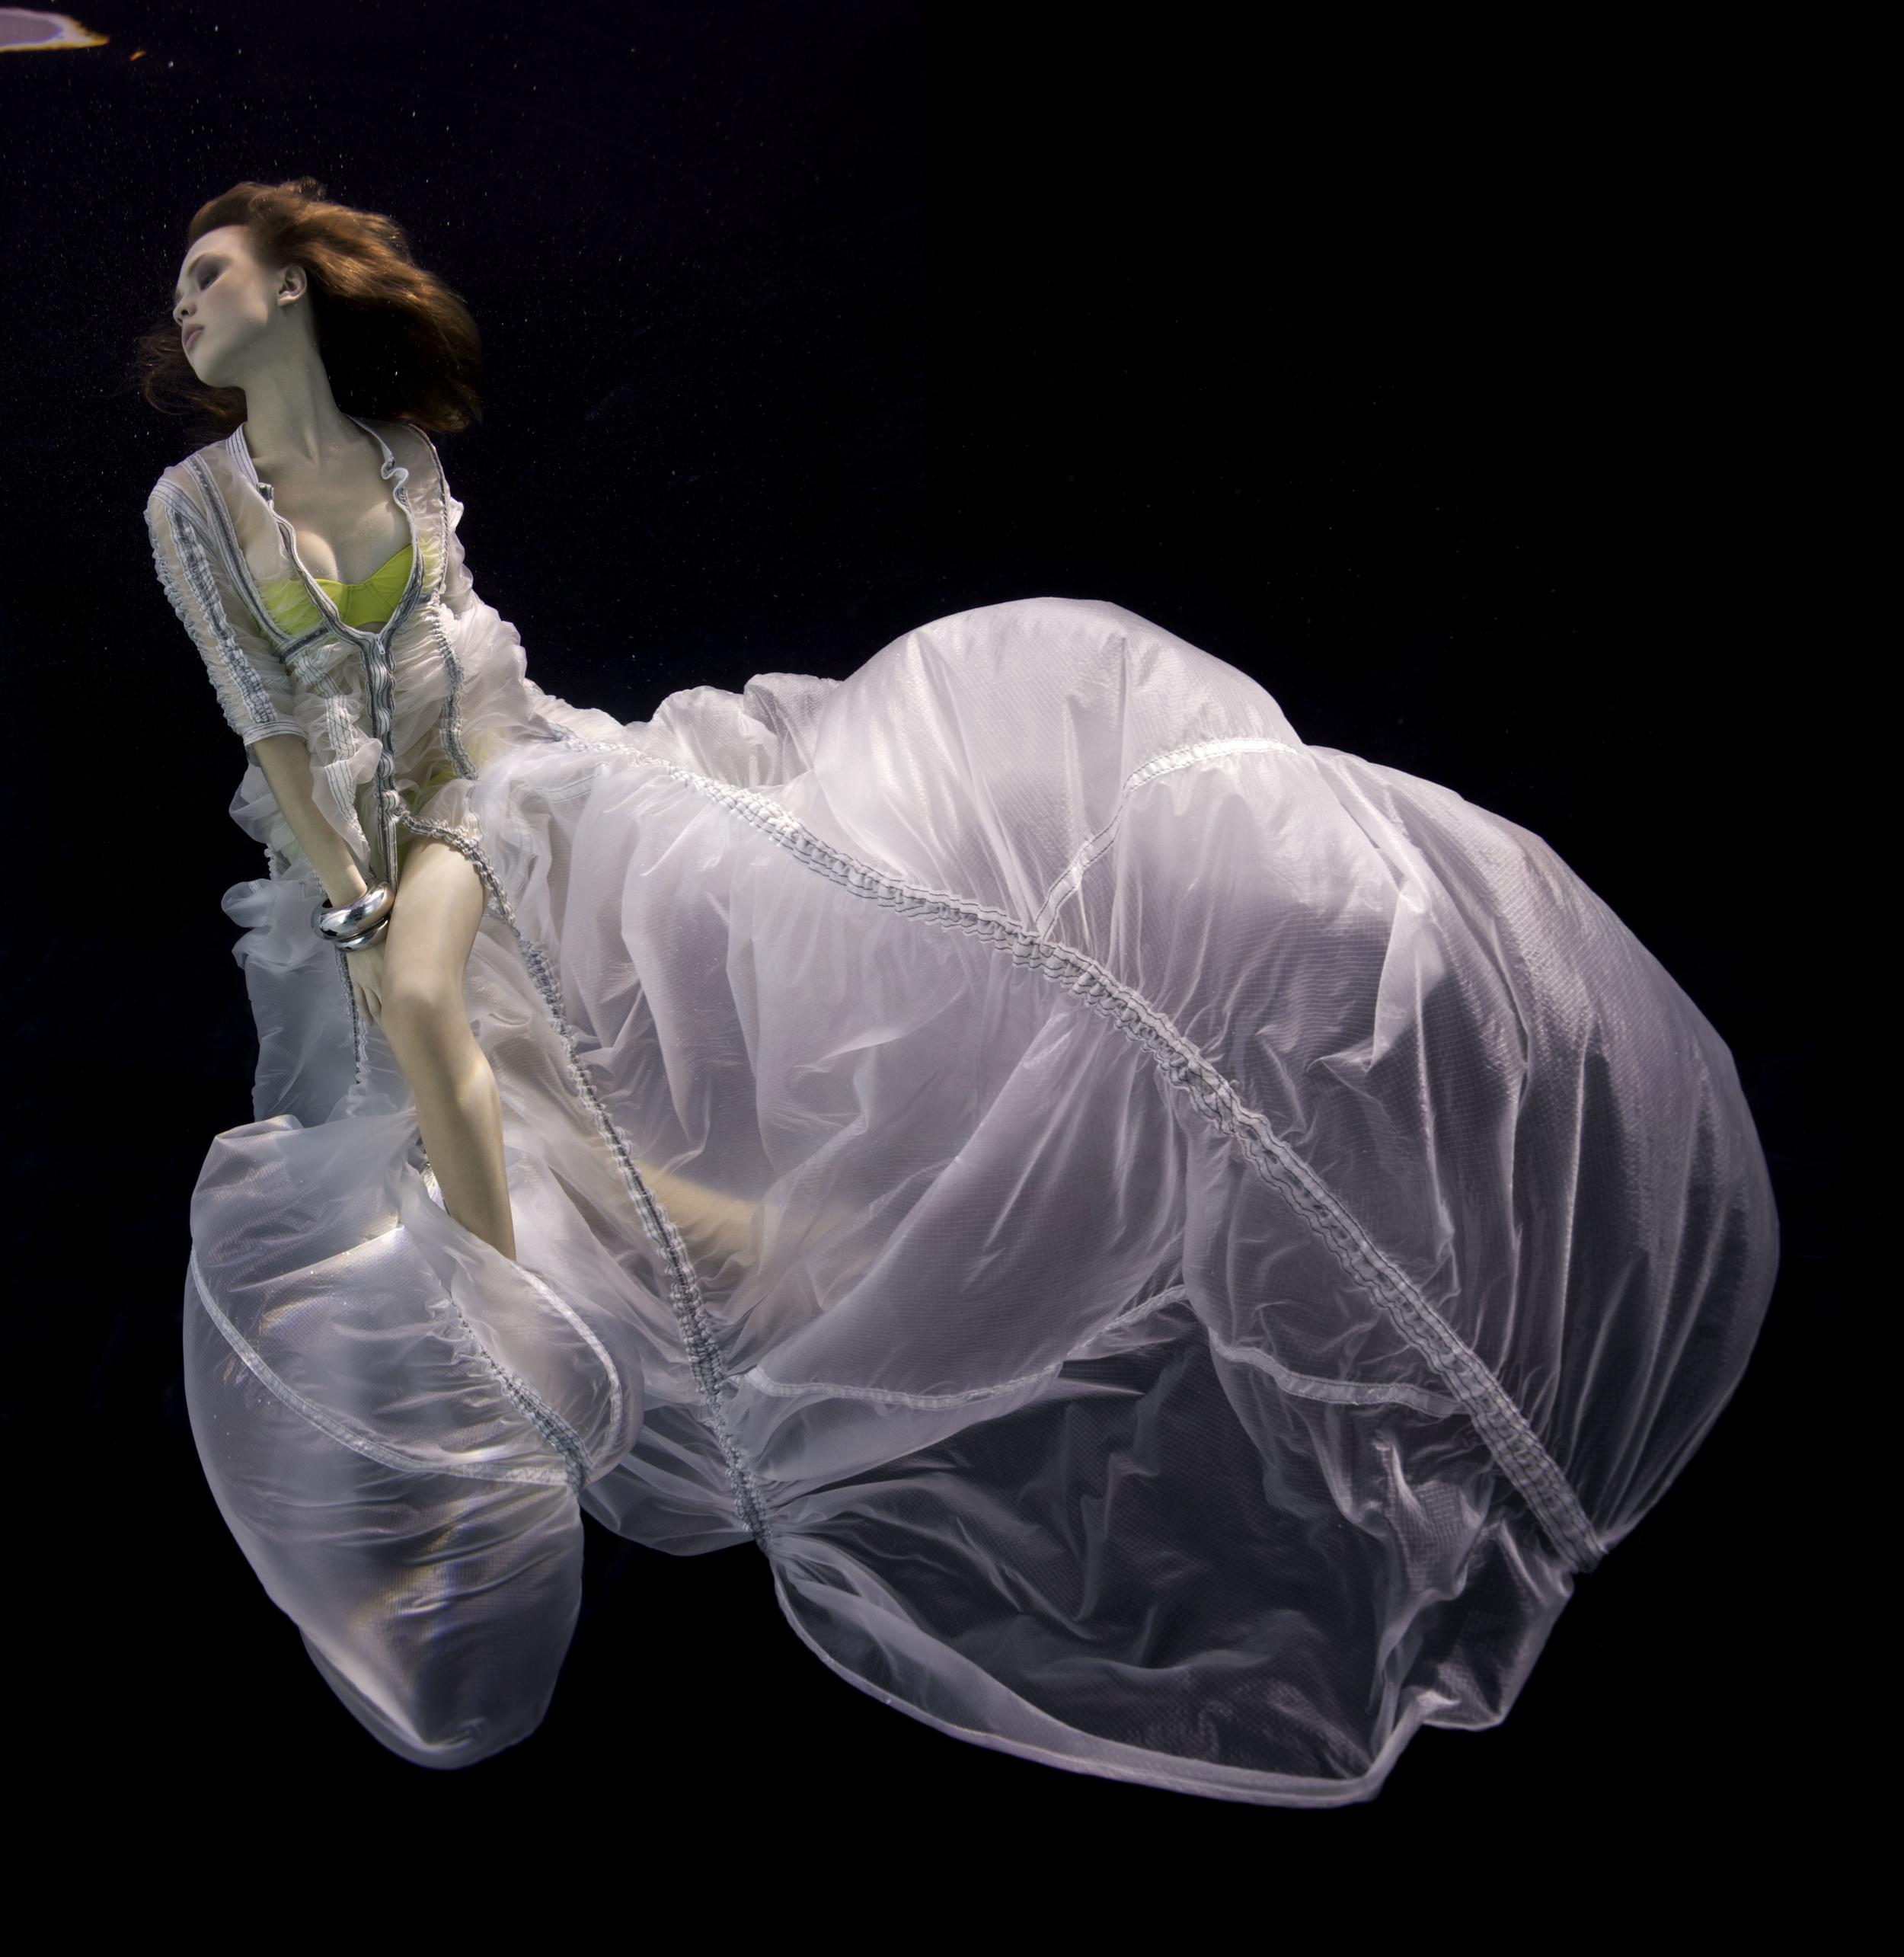 Underwater Study 3223, 2011, Howard Schatz